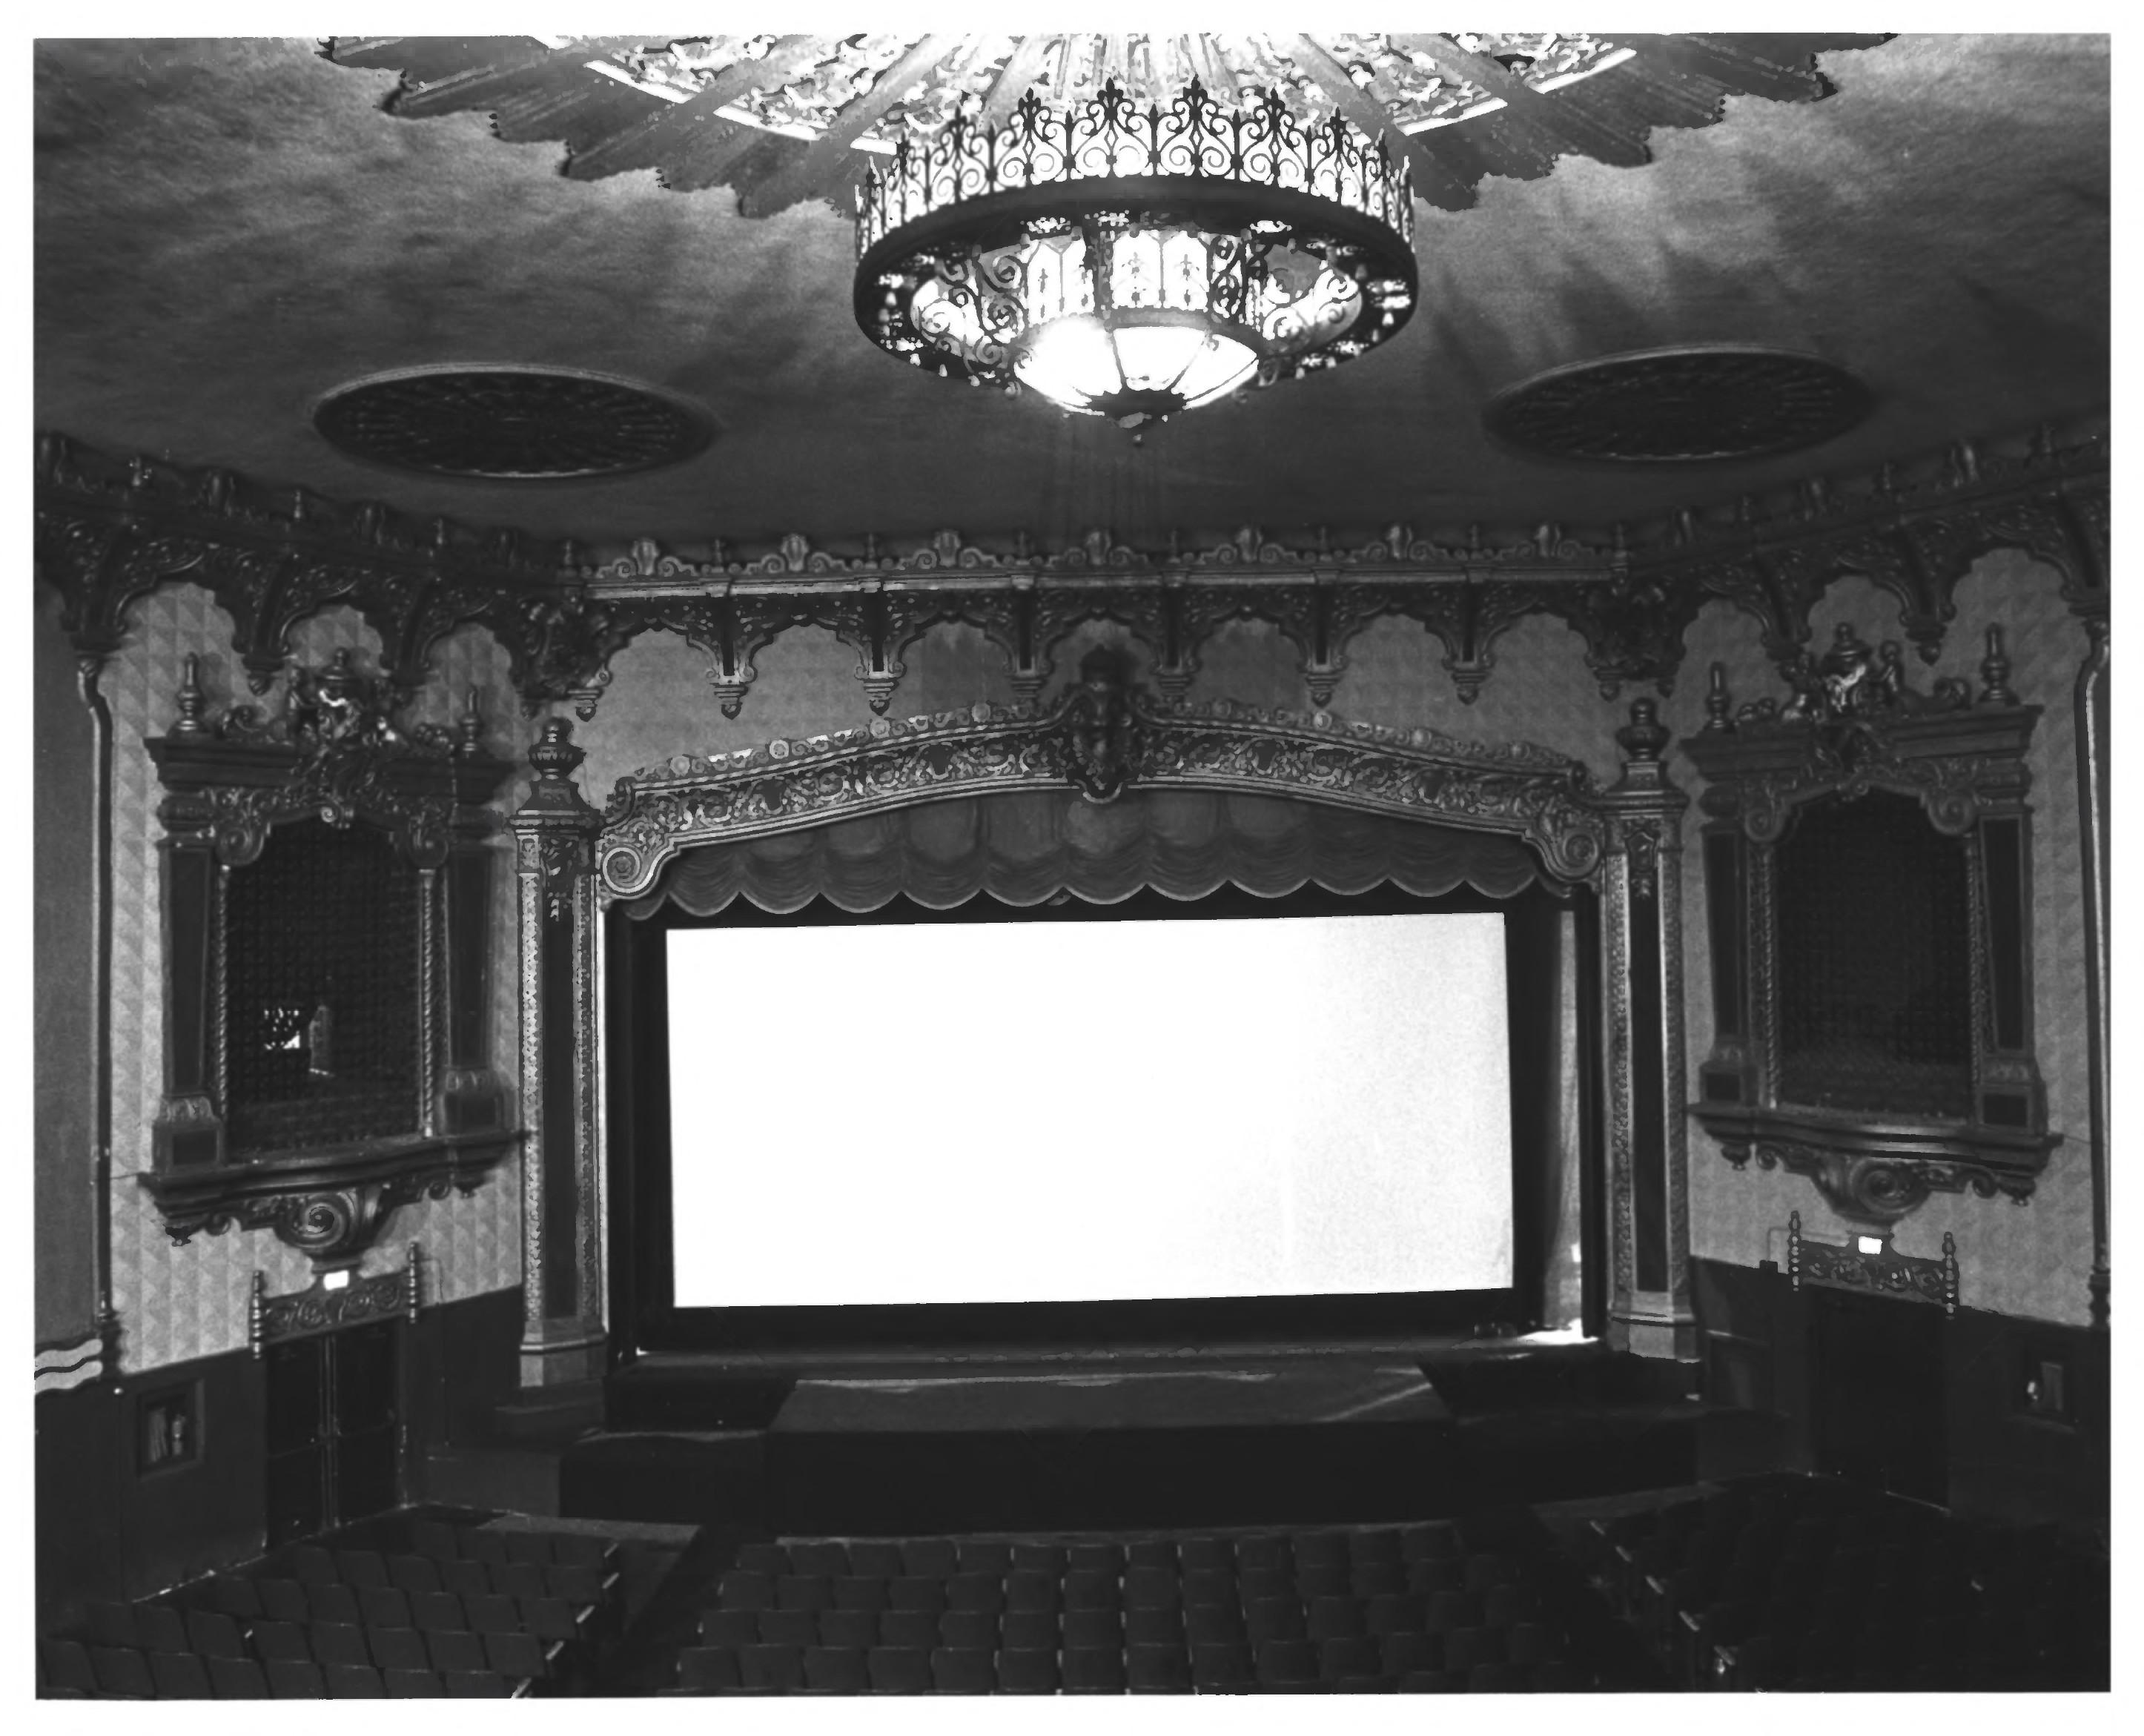 Ventura_theater_movie_1928